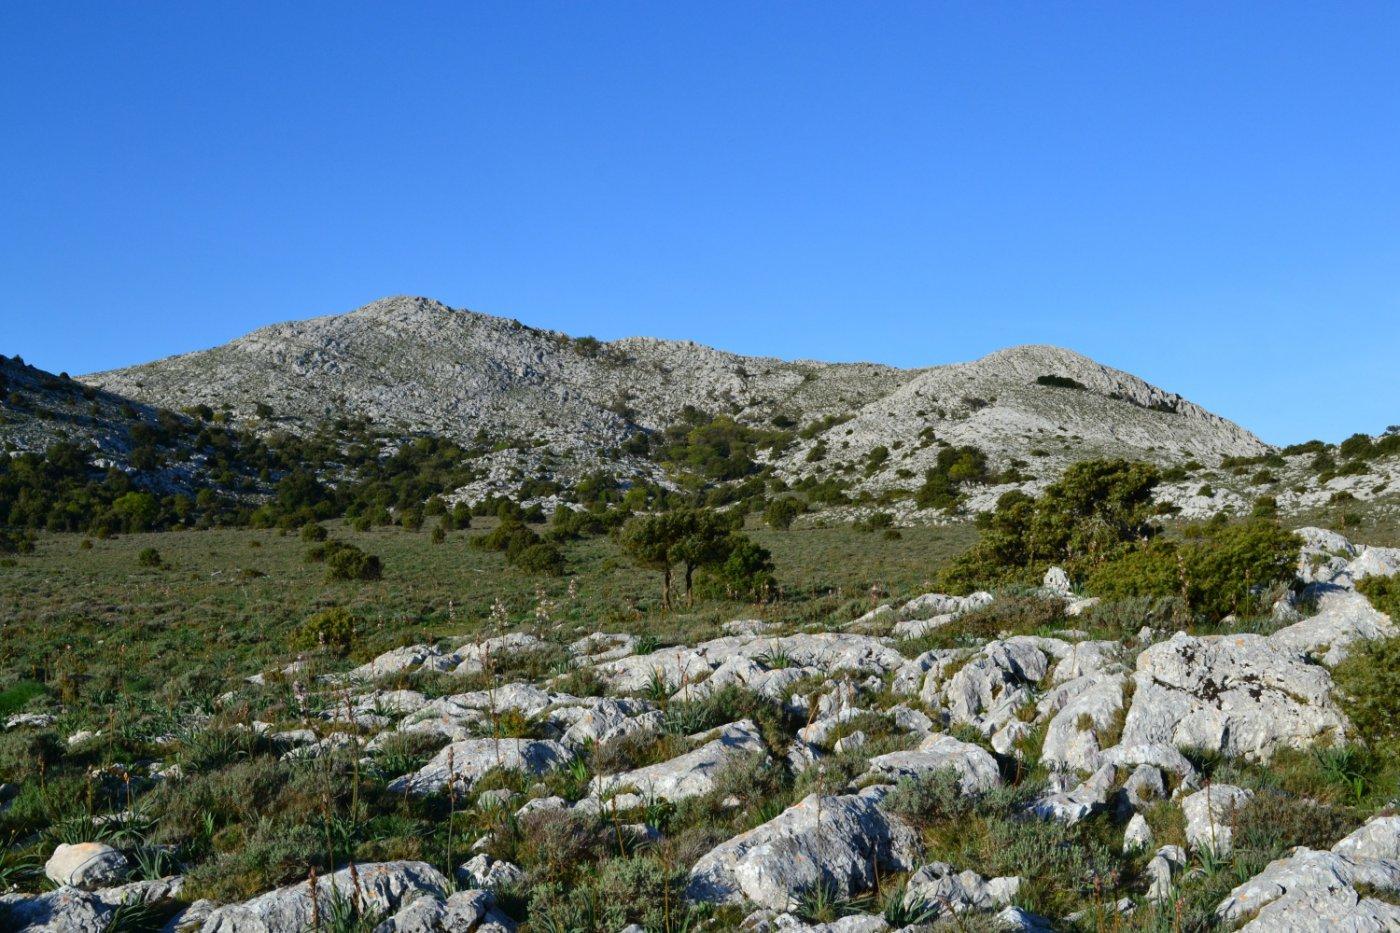 l'altipiano di Su Campu 'e Susu con la Punta Catirina a sinistra